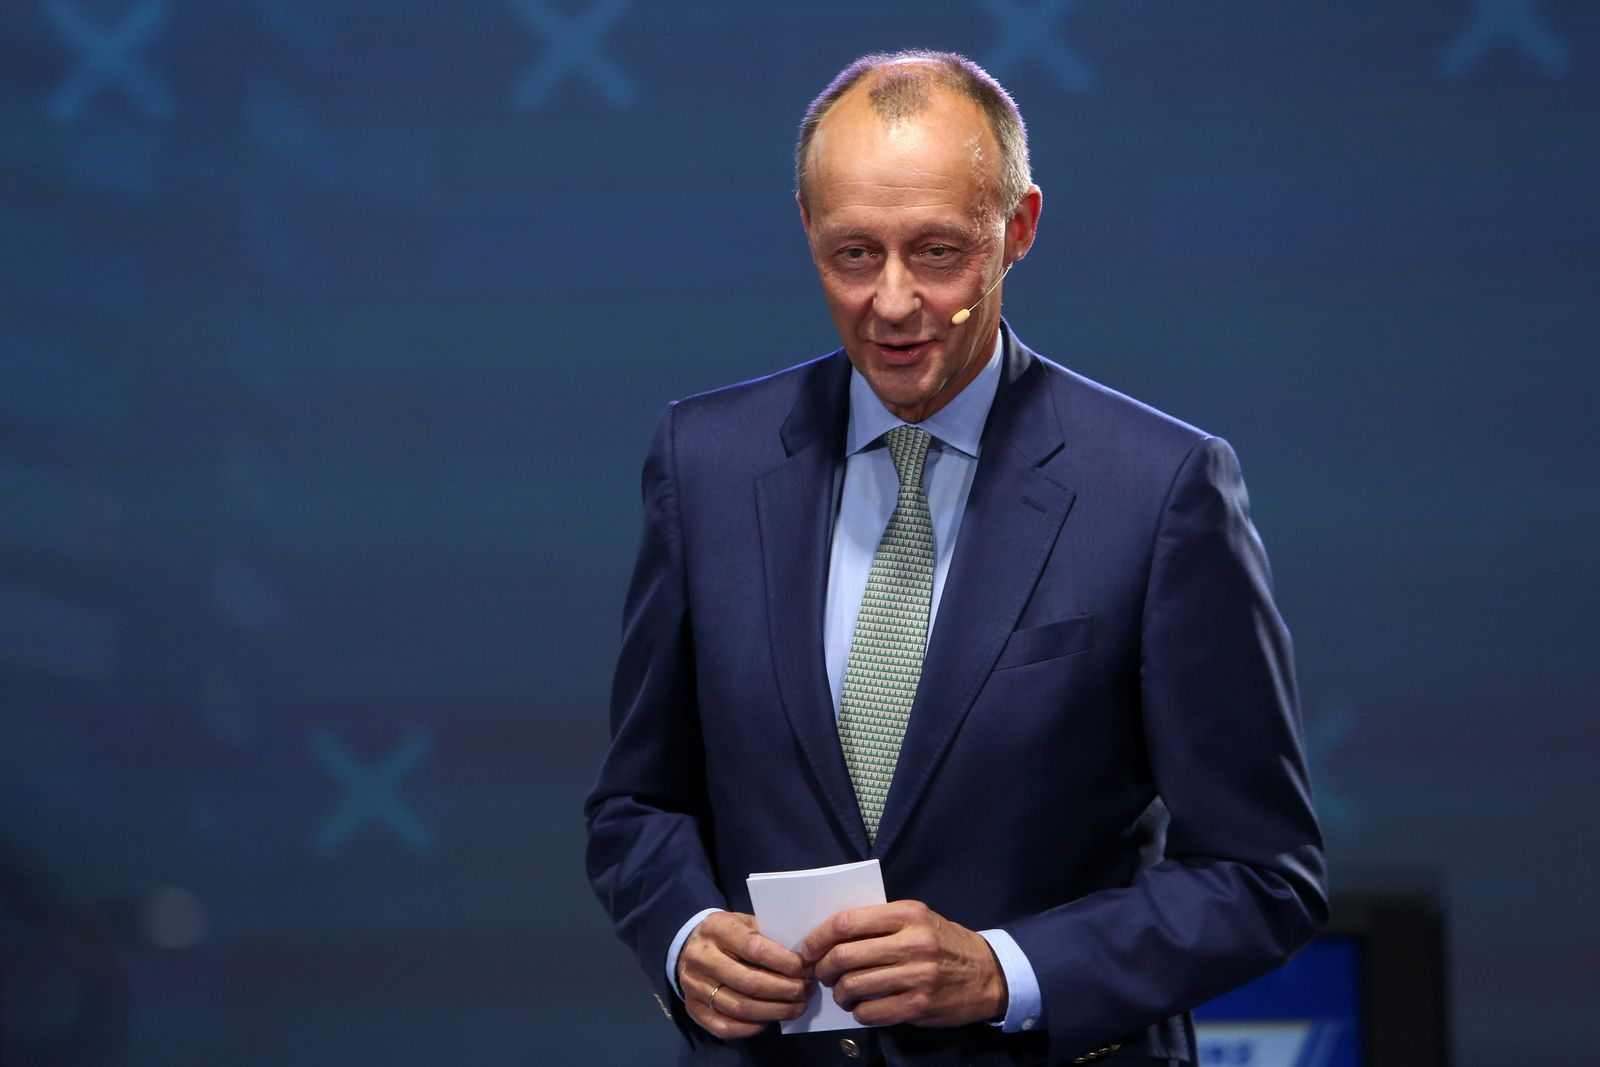 CDU Candidates Merz, Laschet And Roettgen Debate In Berlin